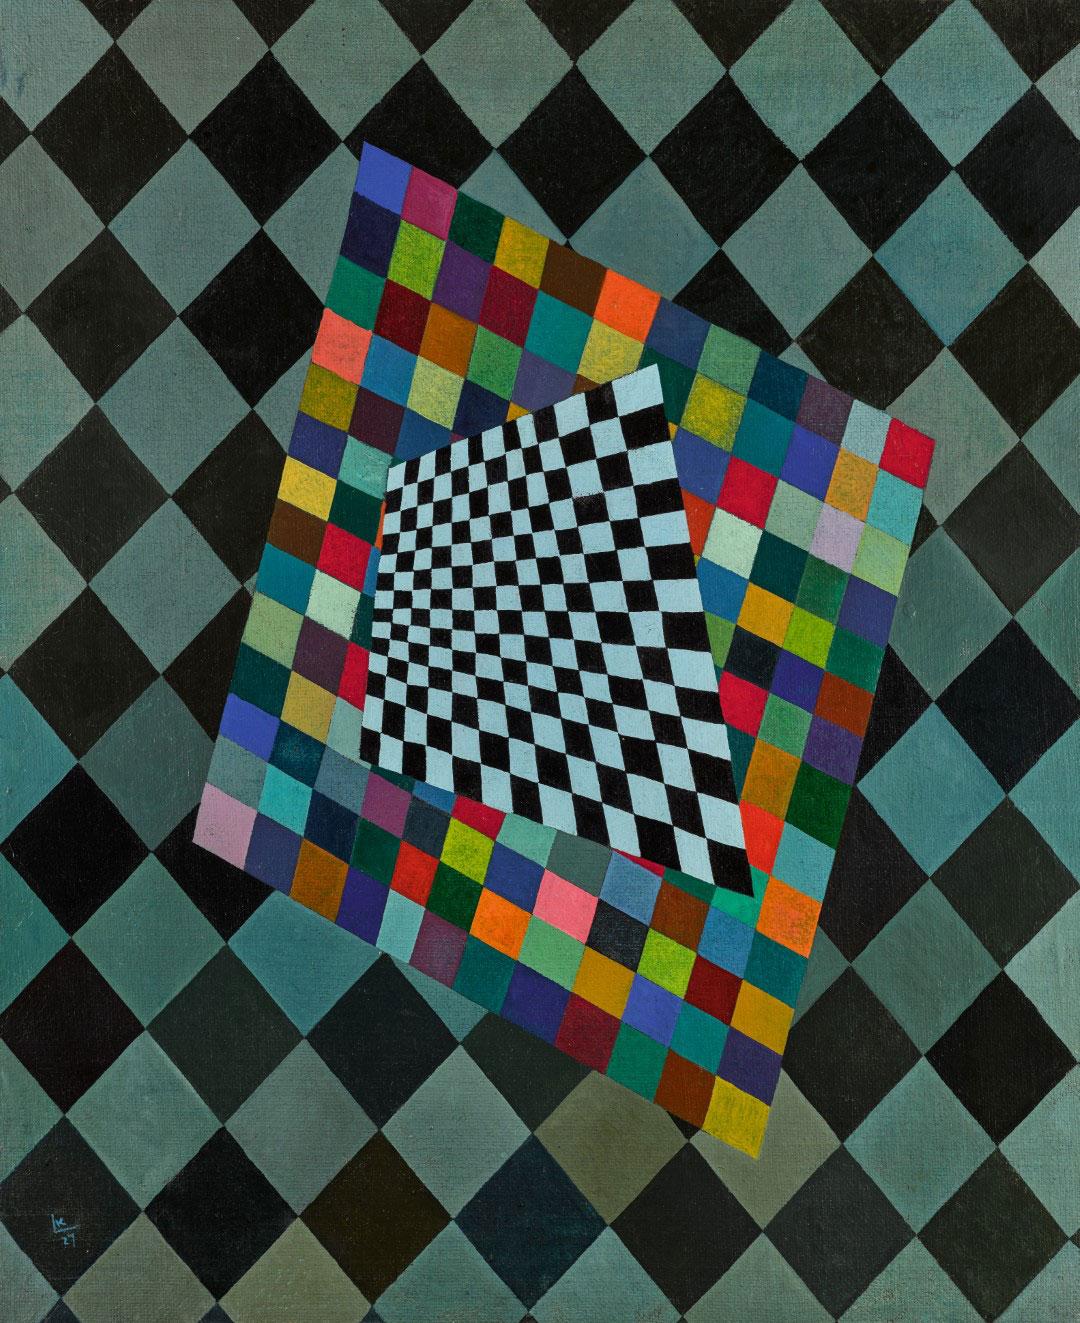 Lot-105,-Wassily-Kandinsky,-Quadrat-(Square),-est_-£1.jpg